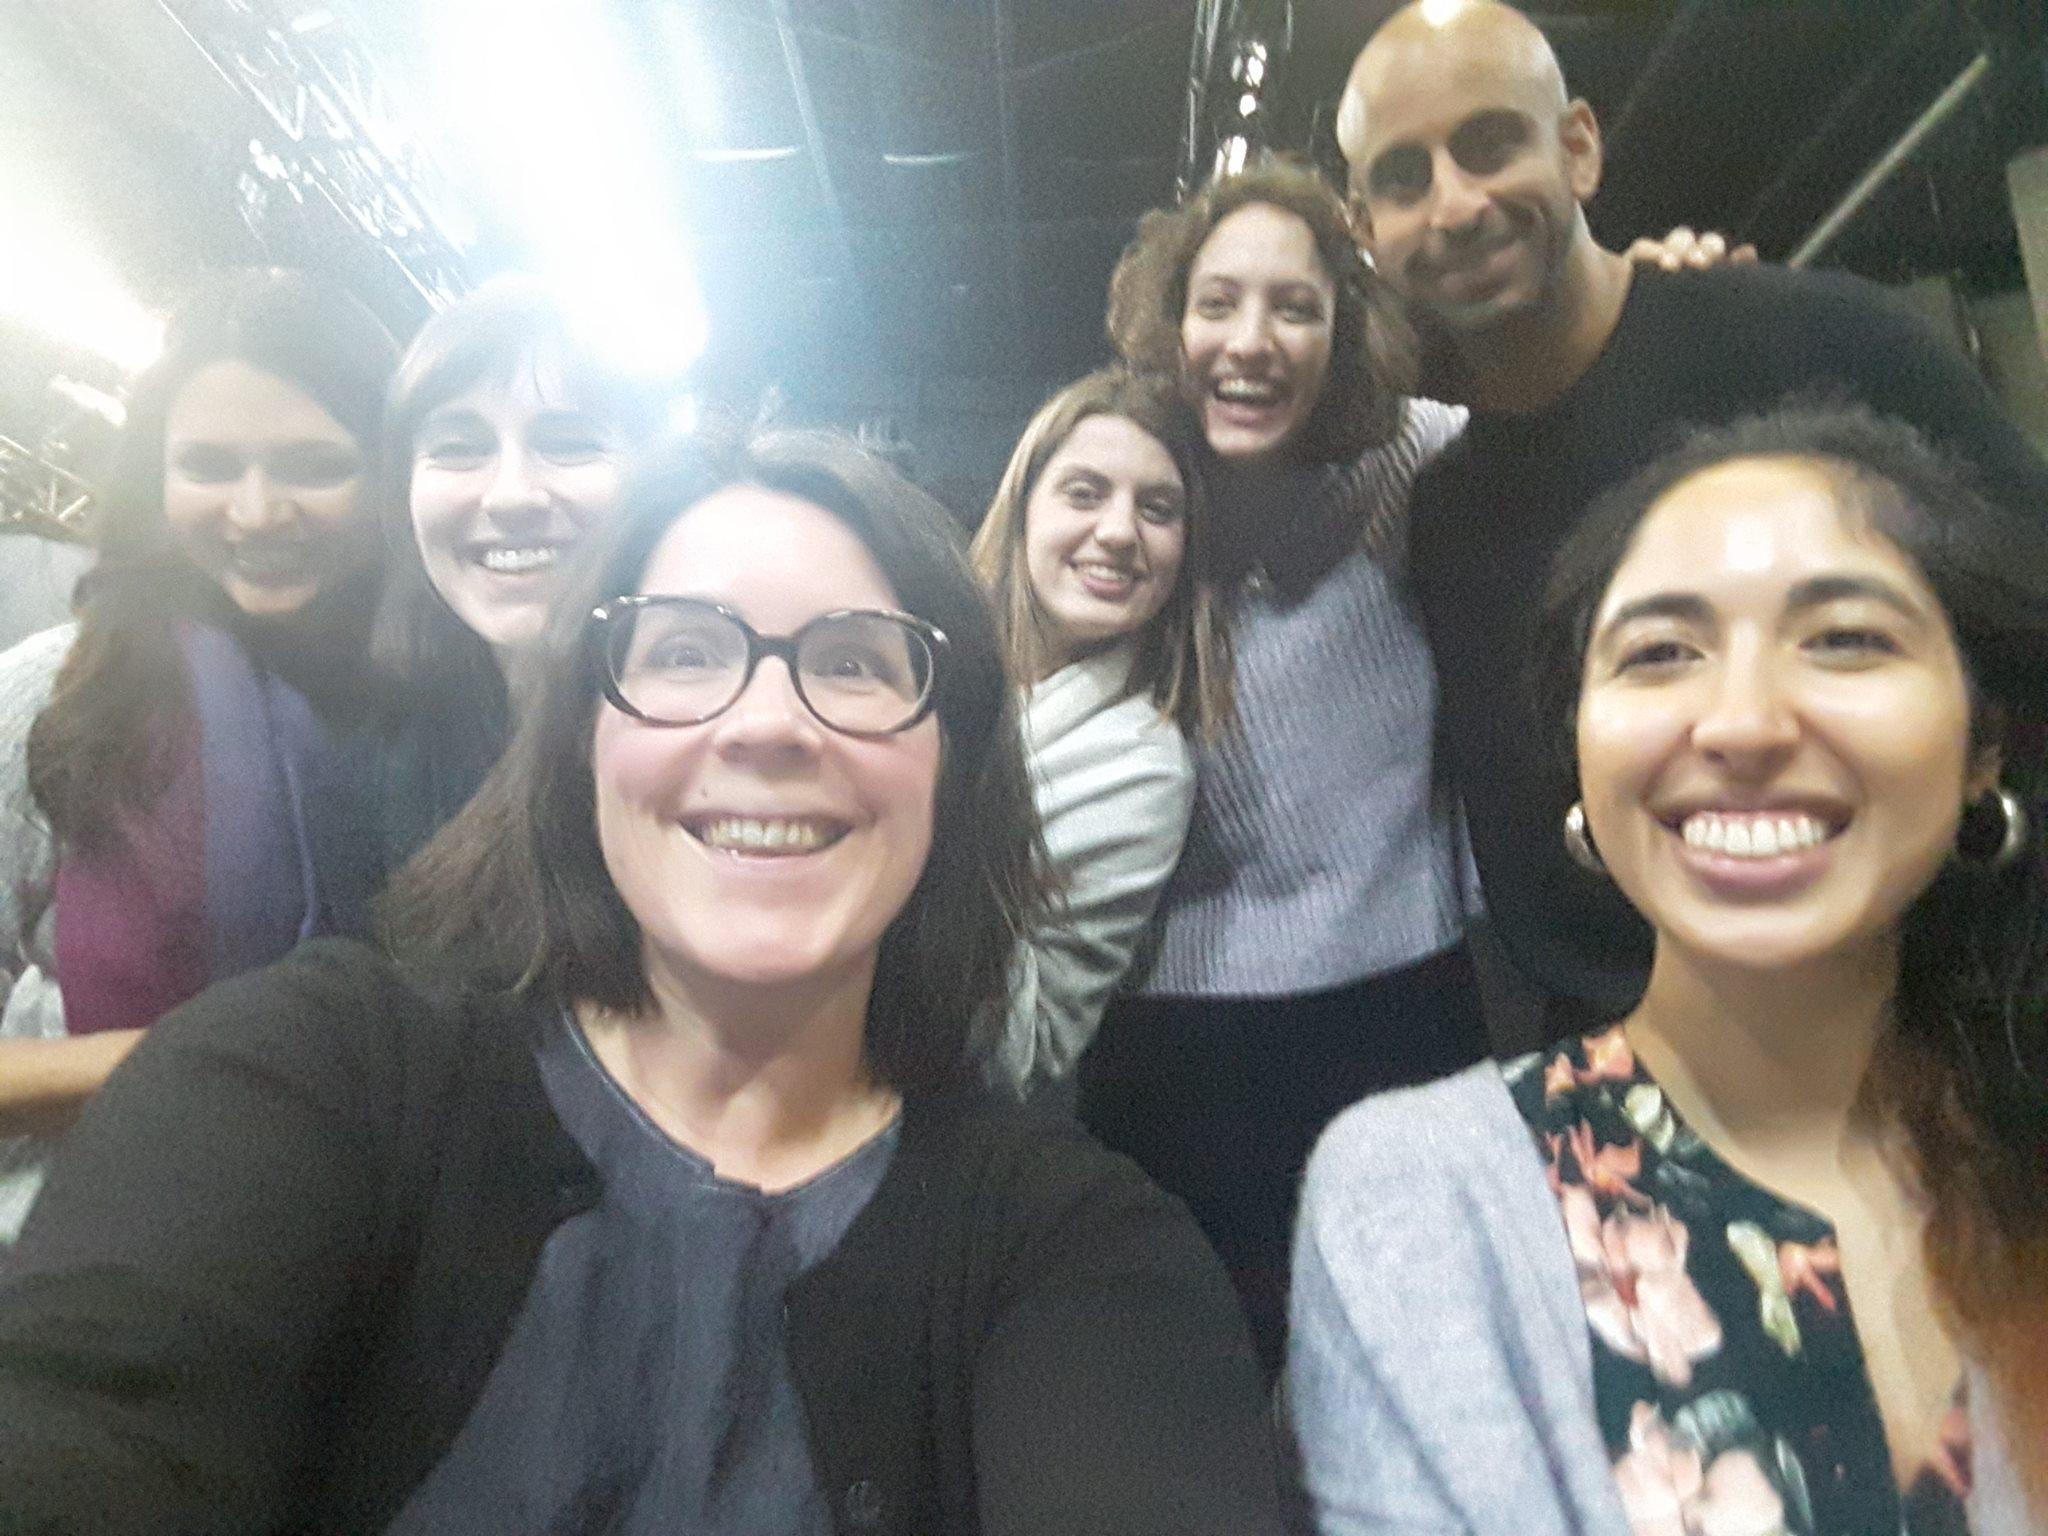 TNB Young Company 2019. Ambica Sharma, Sharisse LeBrun, Laura-beth Bird, Ivy Charles, Natasha Maclellan, Mona Malik and Zeshaun Sal. Photo Credit: Mona Malik.